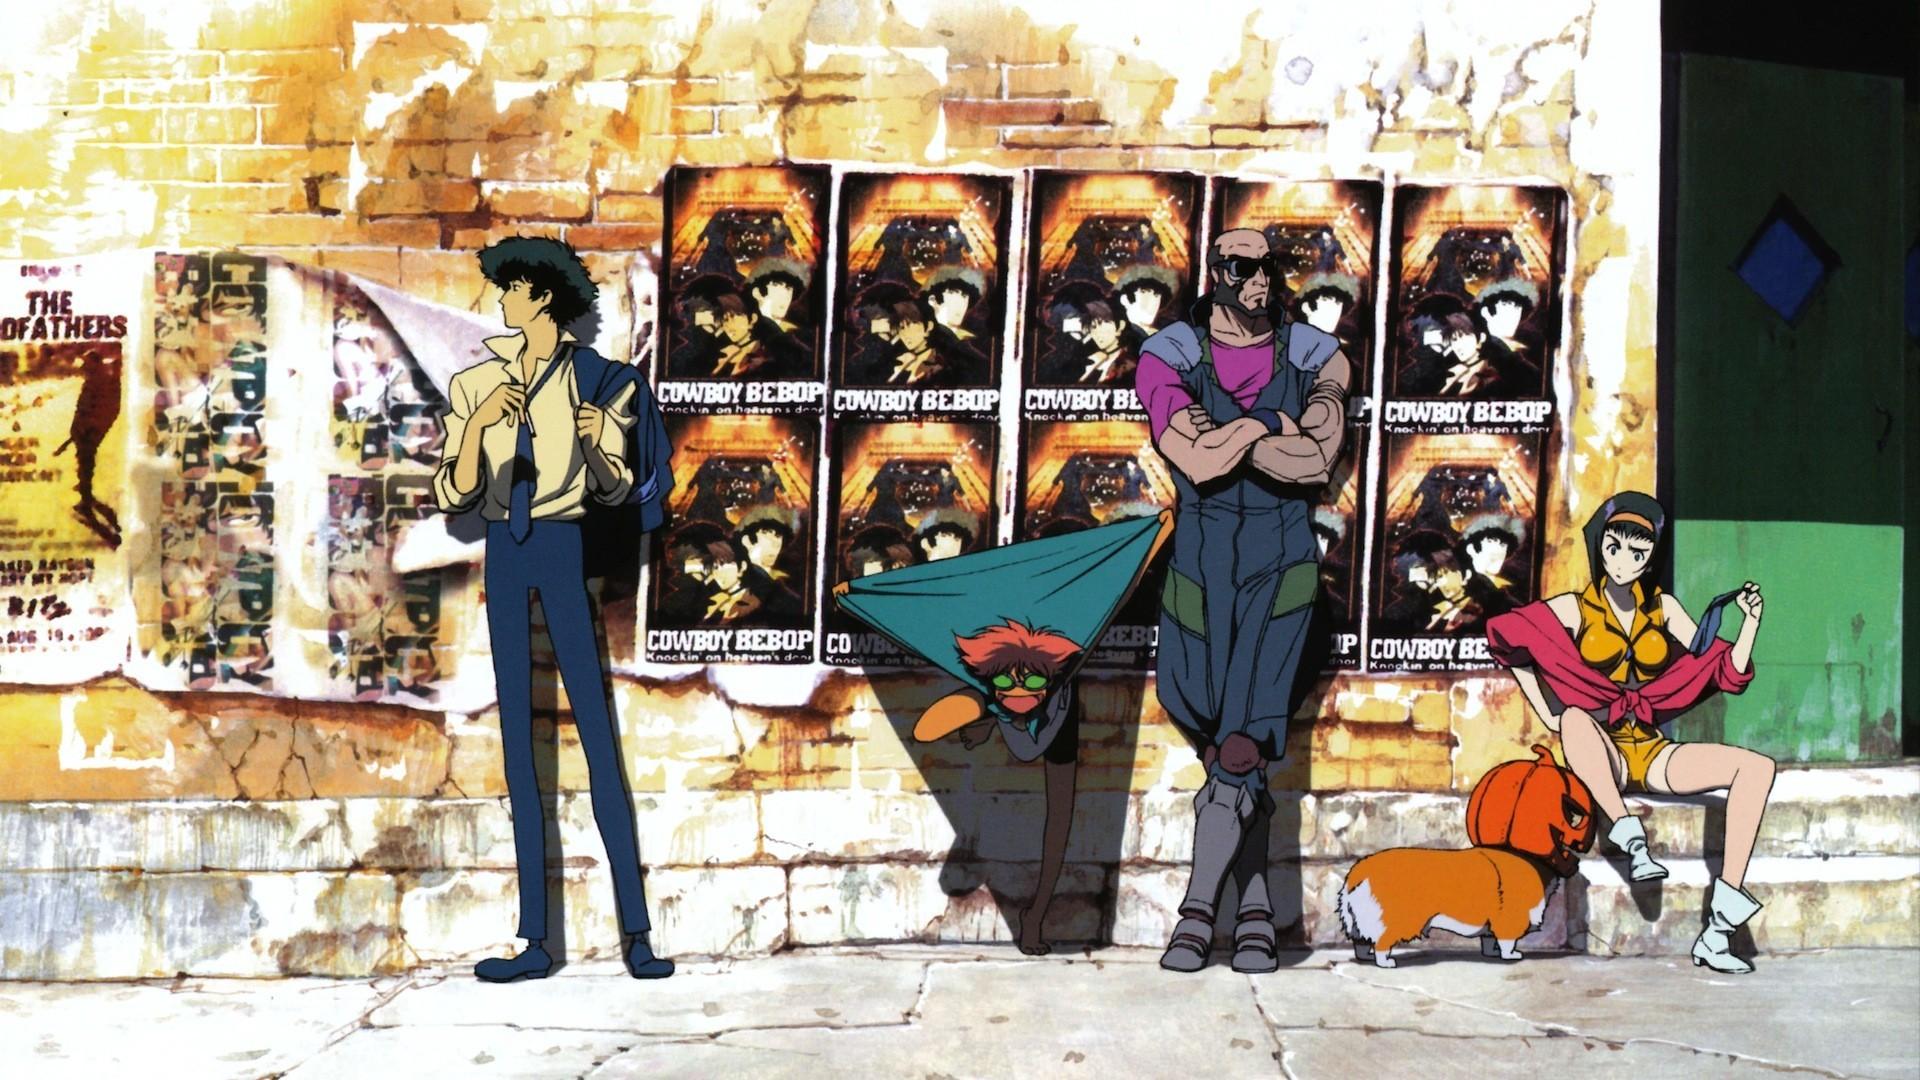 cowboy-bebop-tengoku-no-tobira-2014-wallpaper